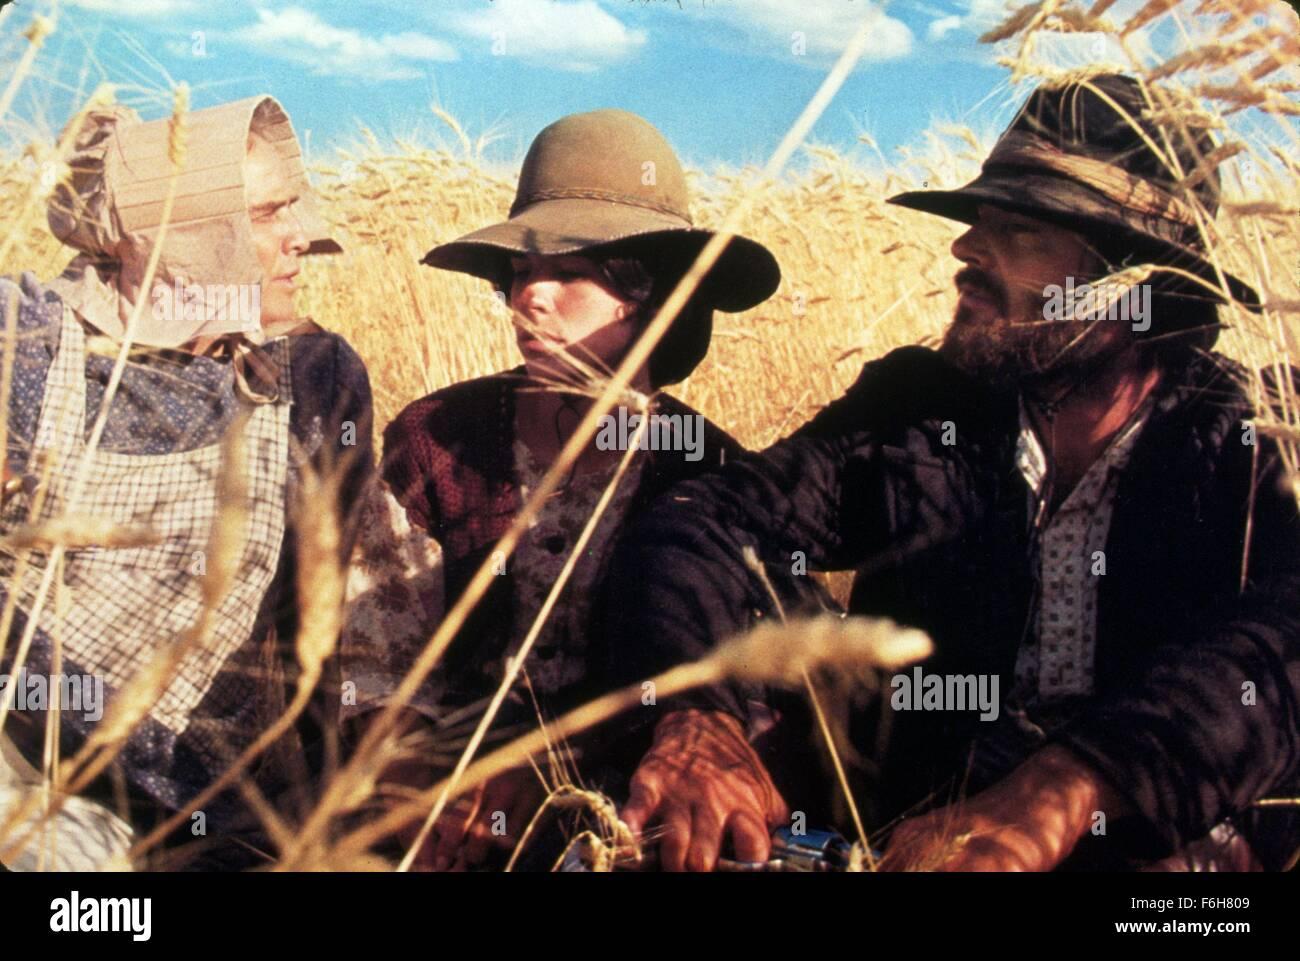 1976, Film Title: MISSOURI BREAKS, Pictured: BEARD, MARLON BRANDO, CLOTHING, COWBOY, DRAG, HAT, KATHLEEN LLOYD, - Stock Image